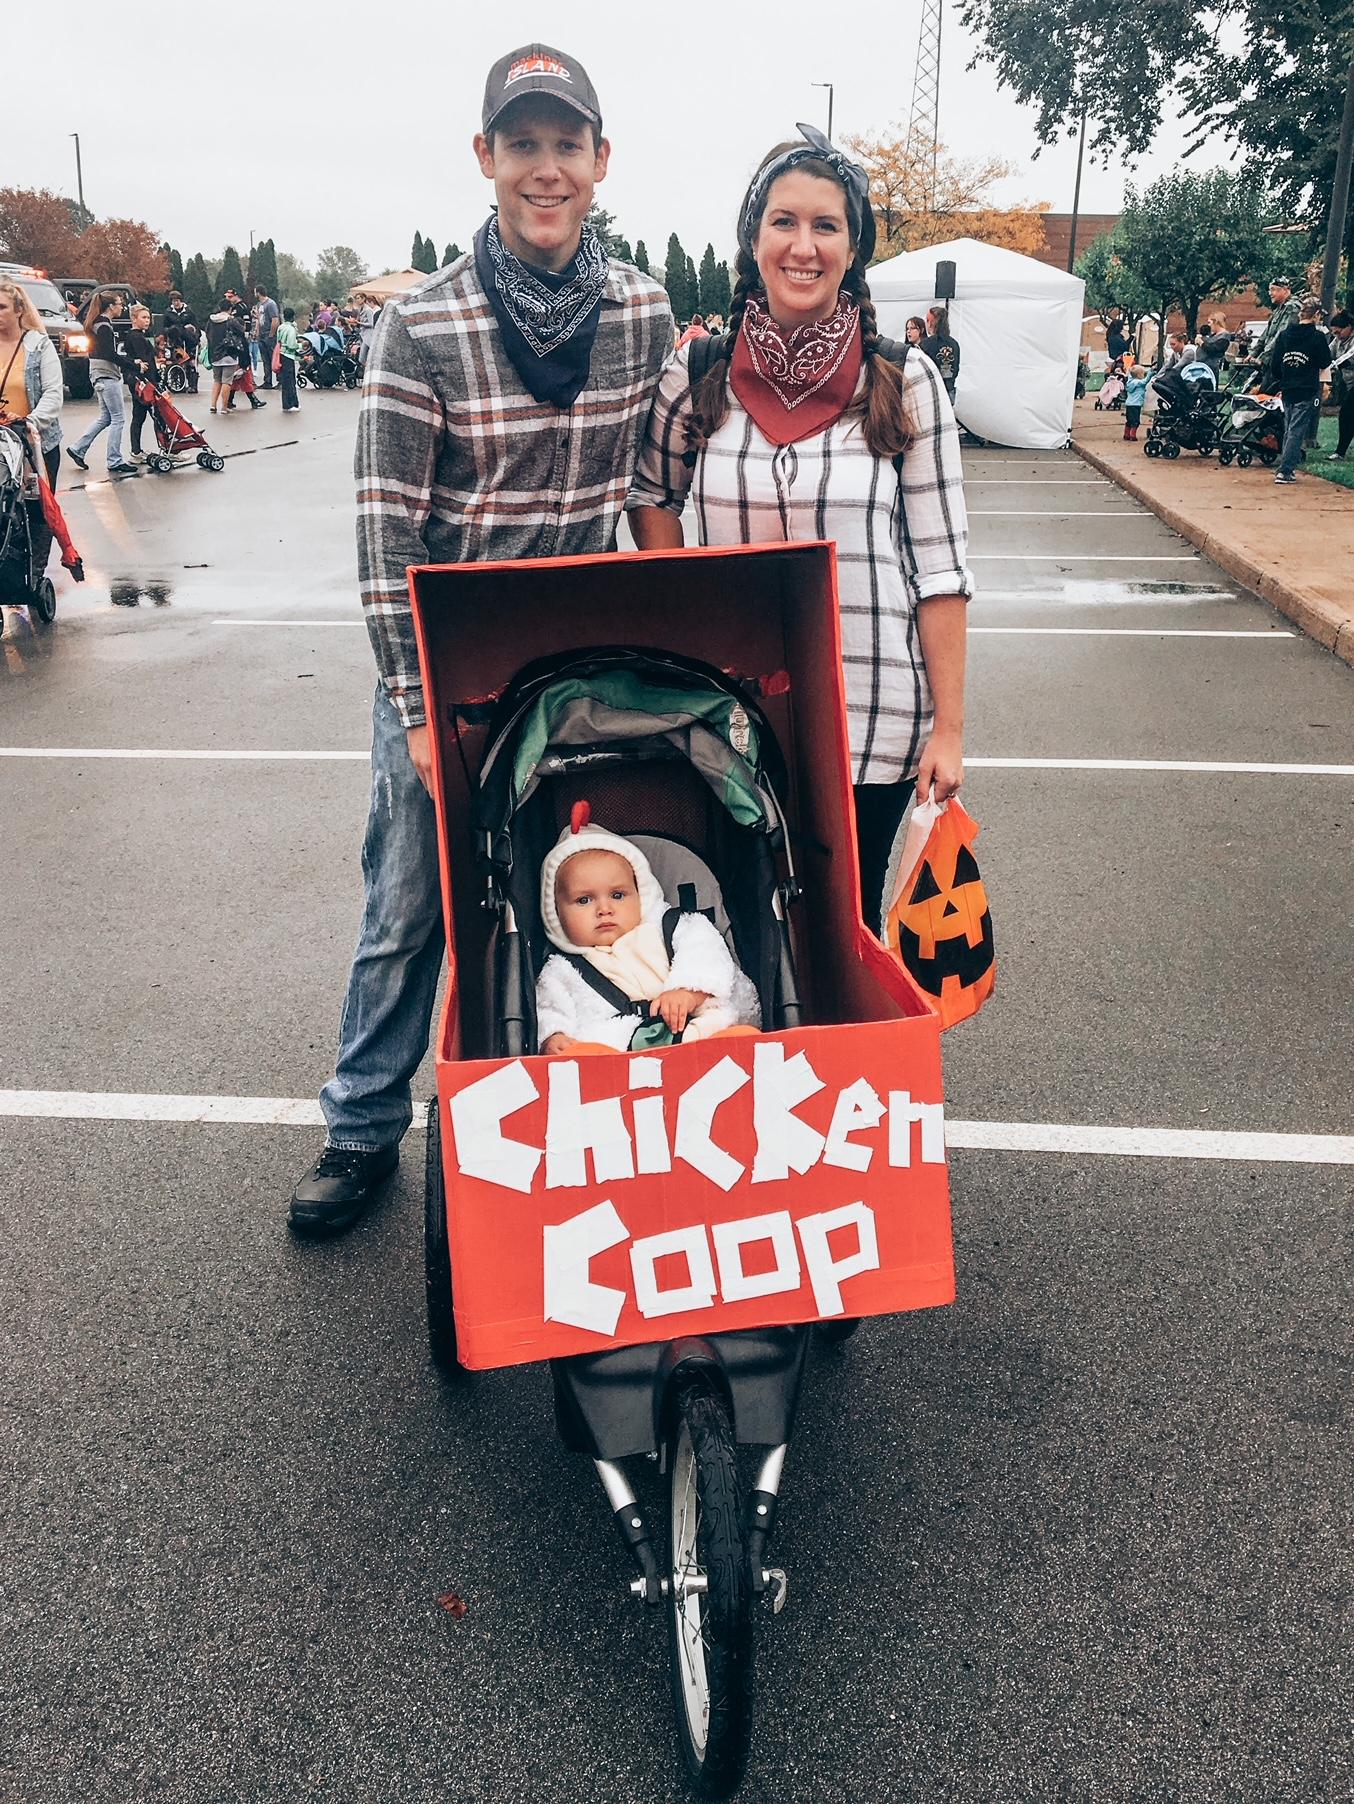 Chicken coop farm family costume